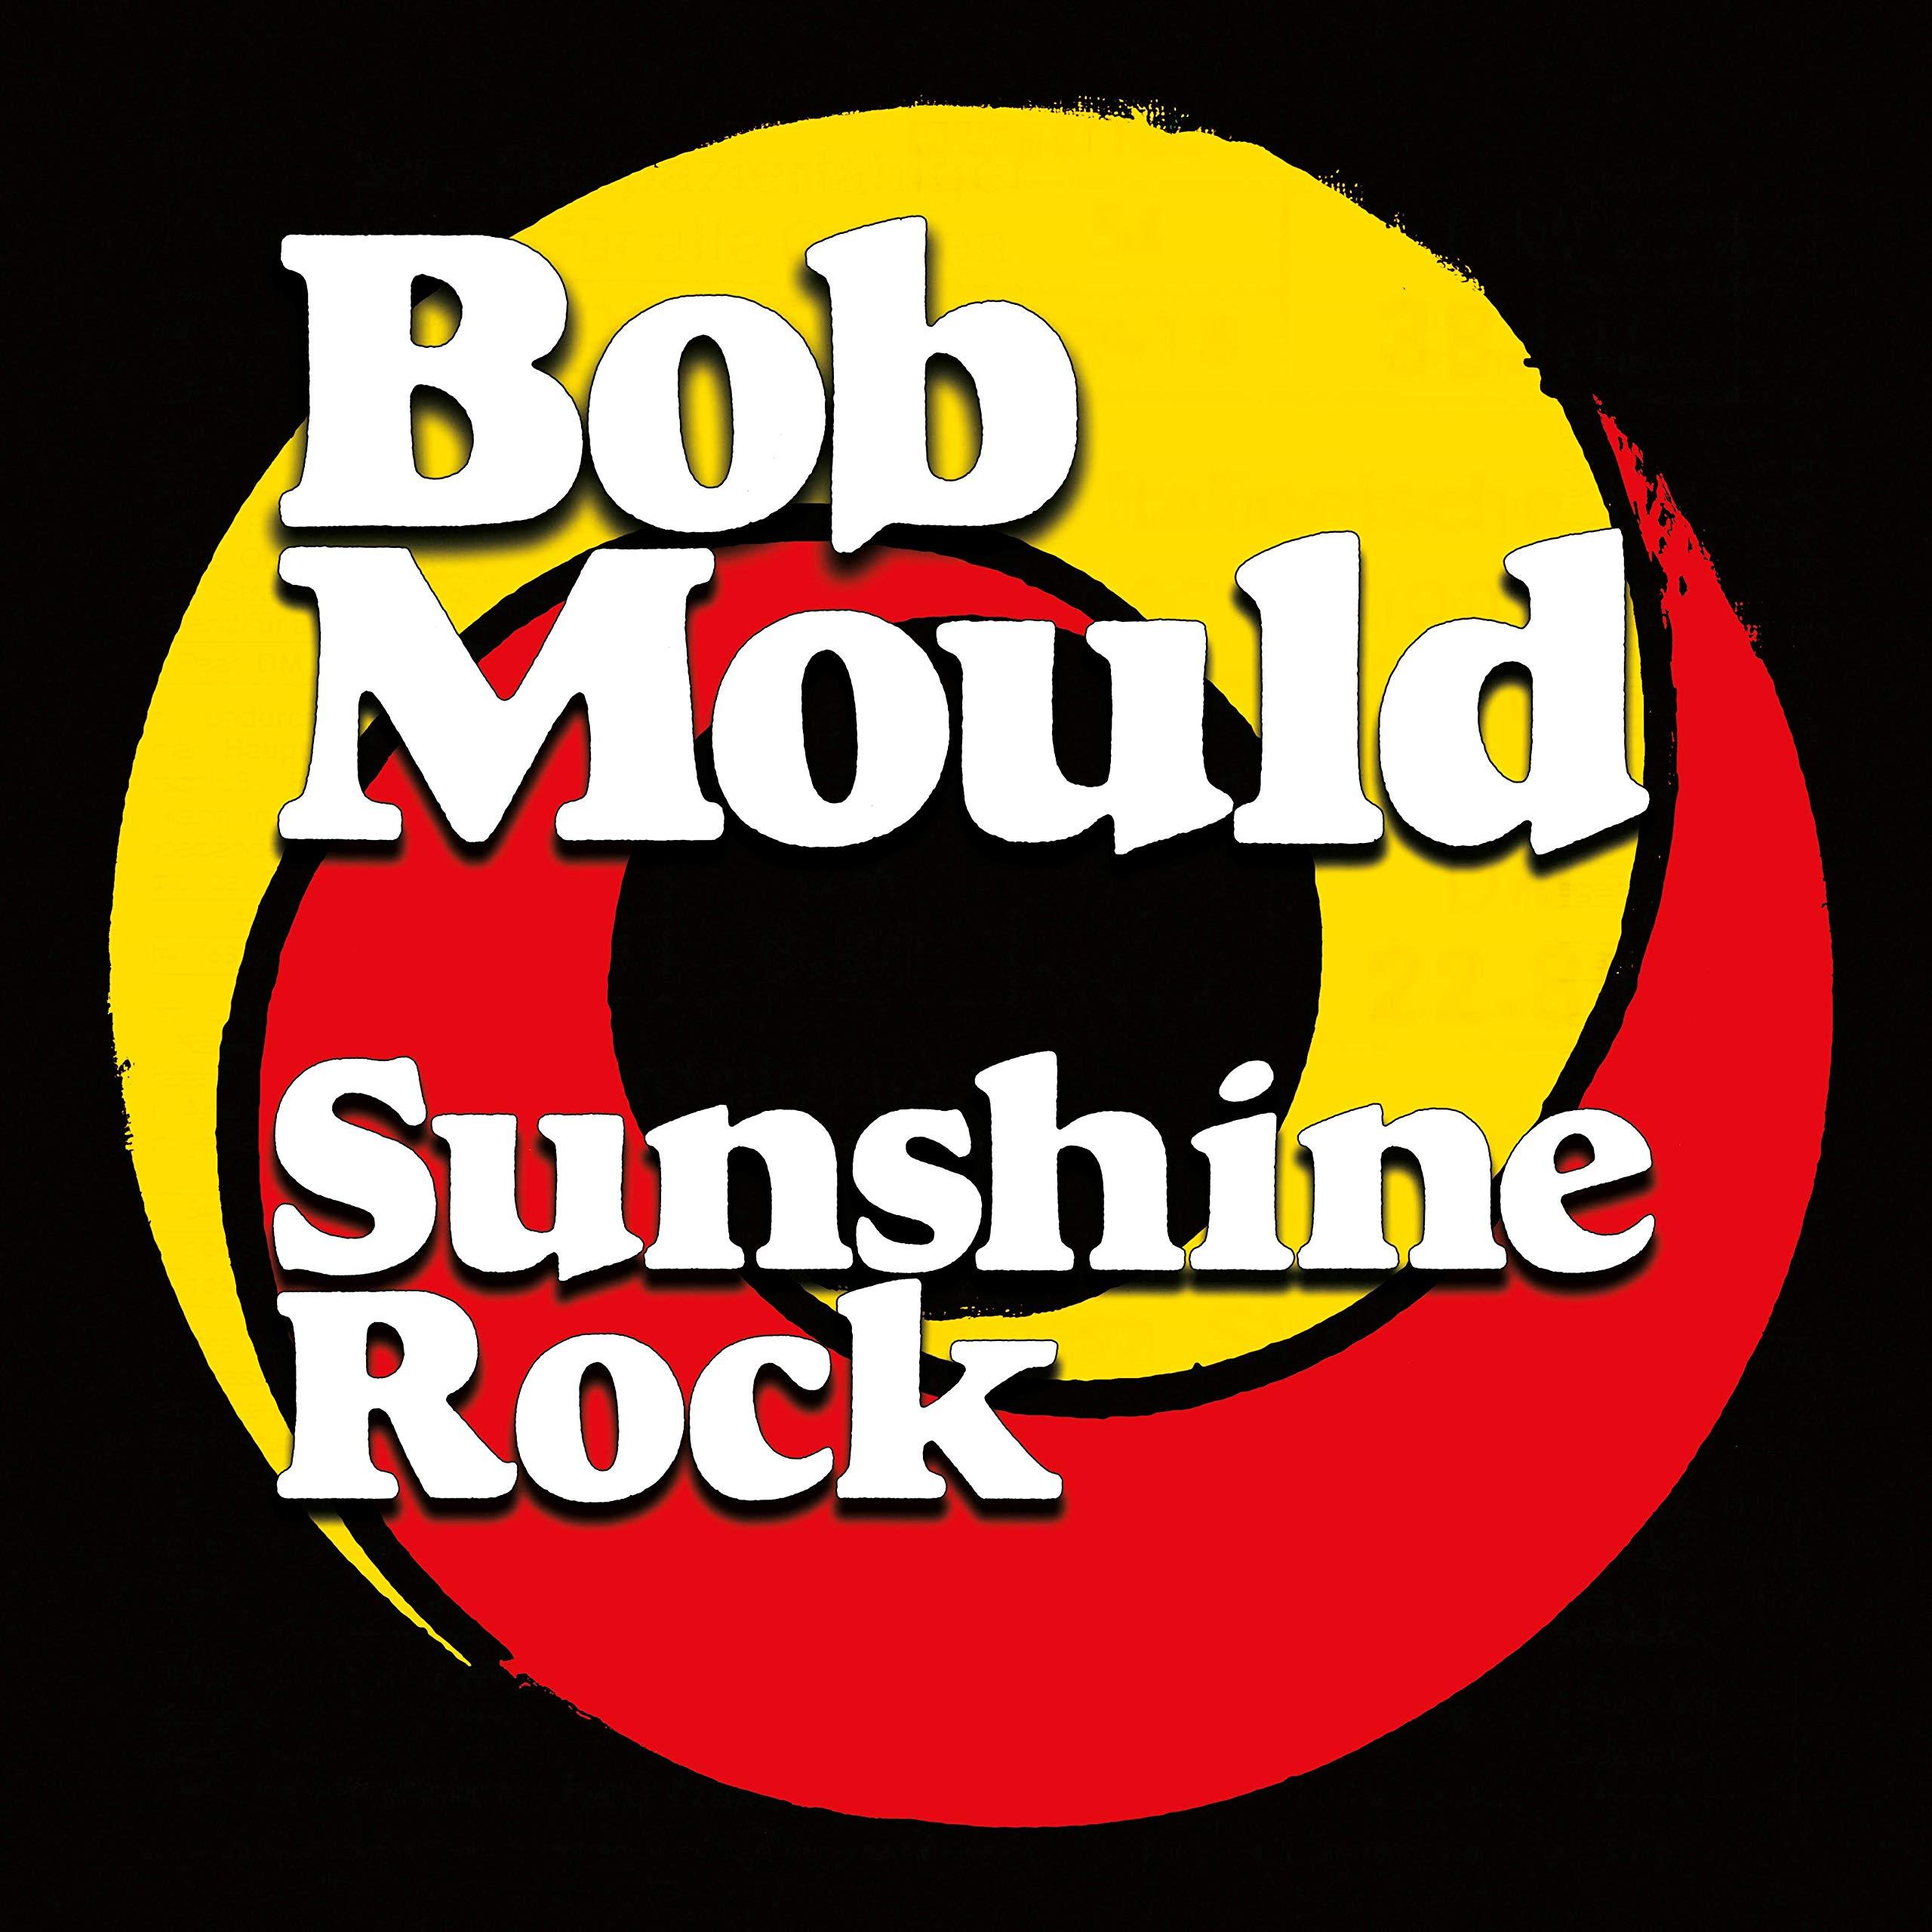 Book Cover: Sunshine Rock